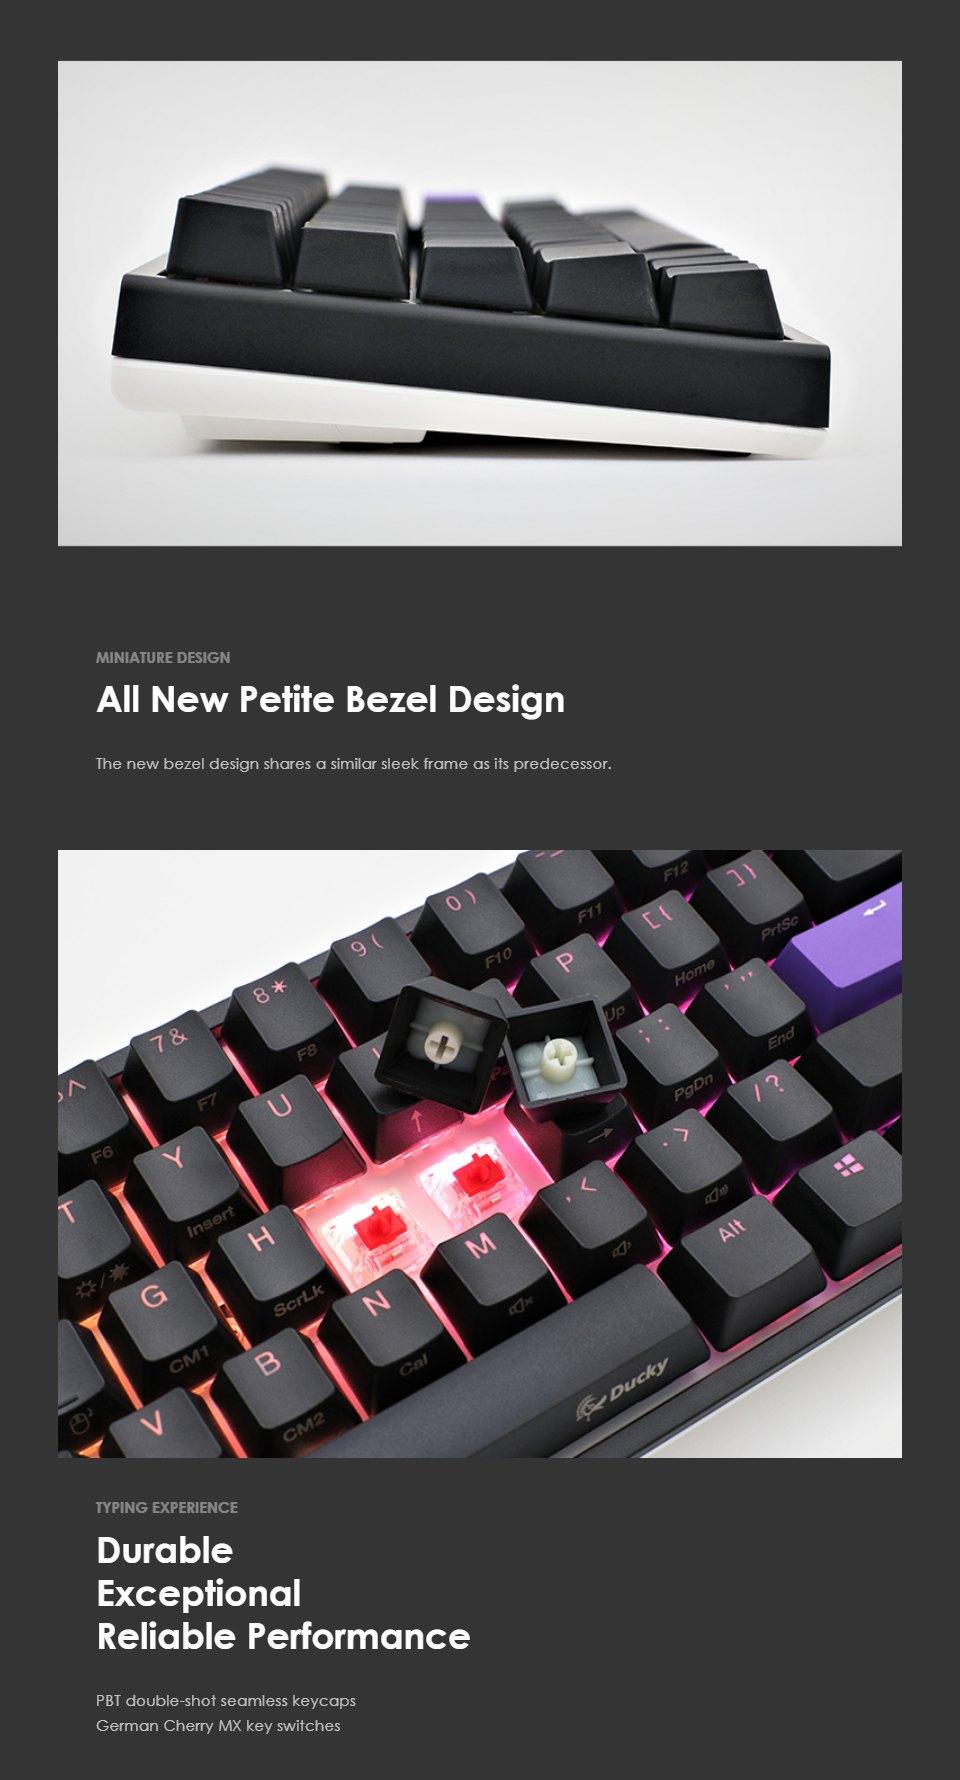 Ducky One 2 Mecha Mini RGB Mechanical Keyboard Blue features